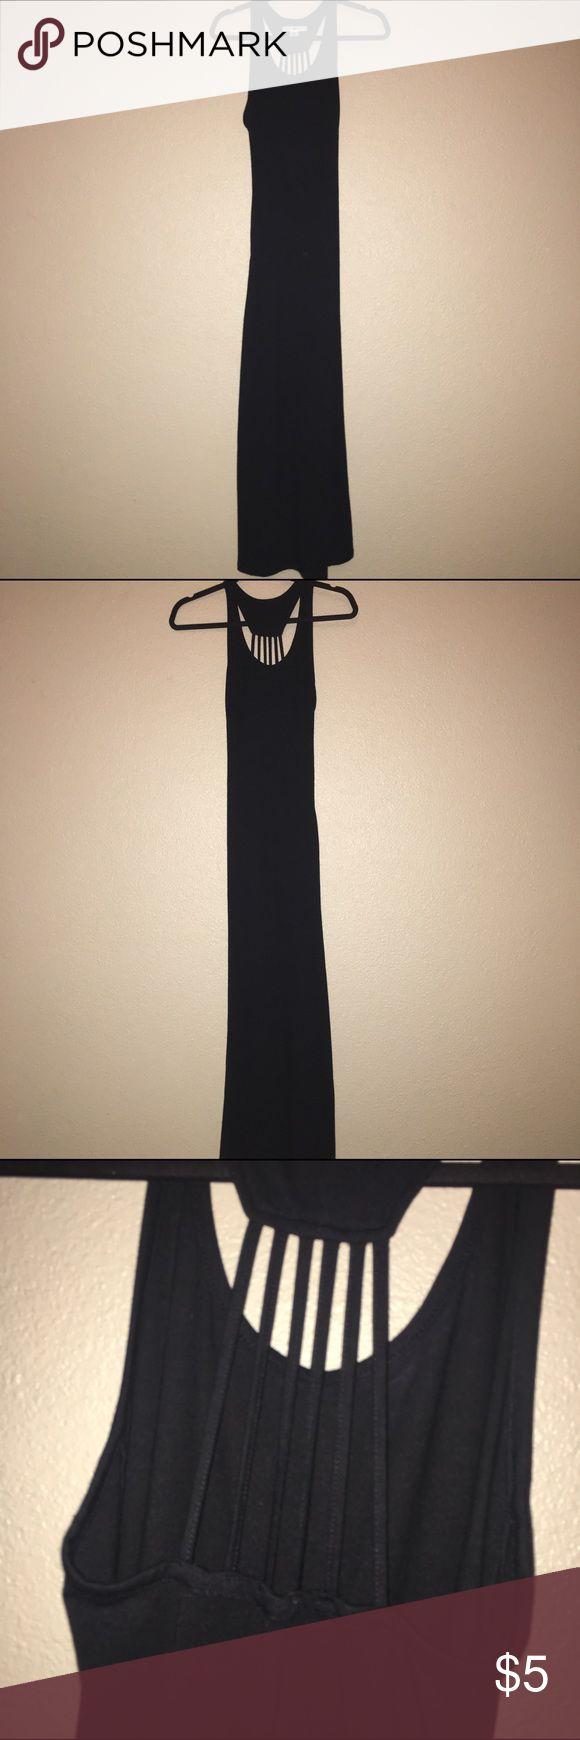 Black Sundress NWOT never worn great condition Dresses